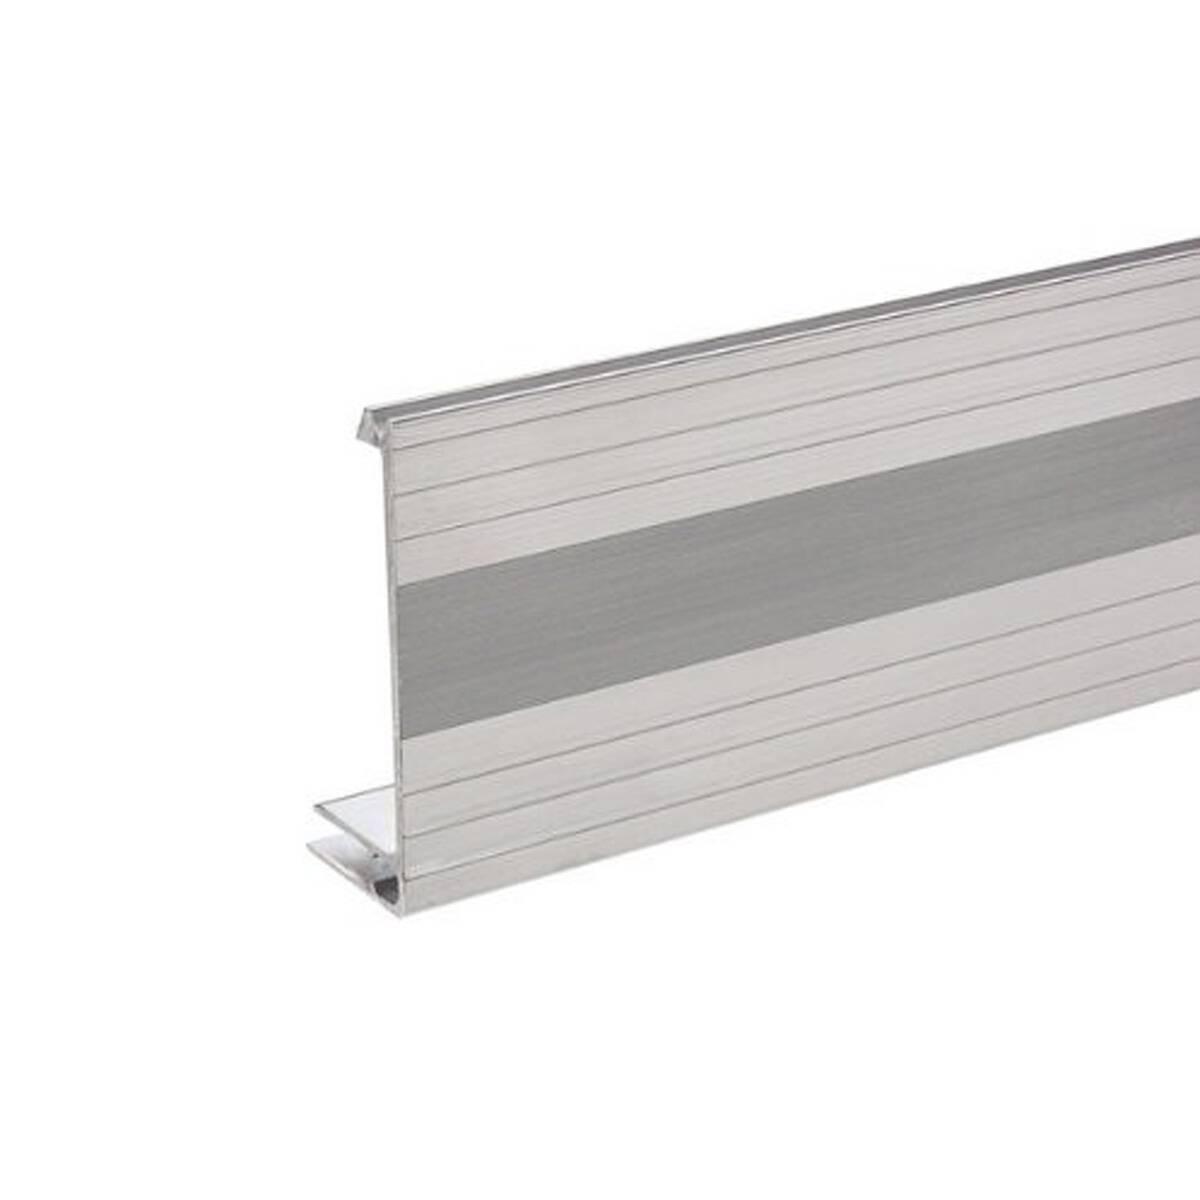 adam hall 6112 aluminium bodenrahmen 80 mm 7 mm einschub. Black Bedroom Furniture Sets. Home Design Ideas